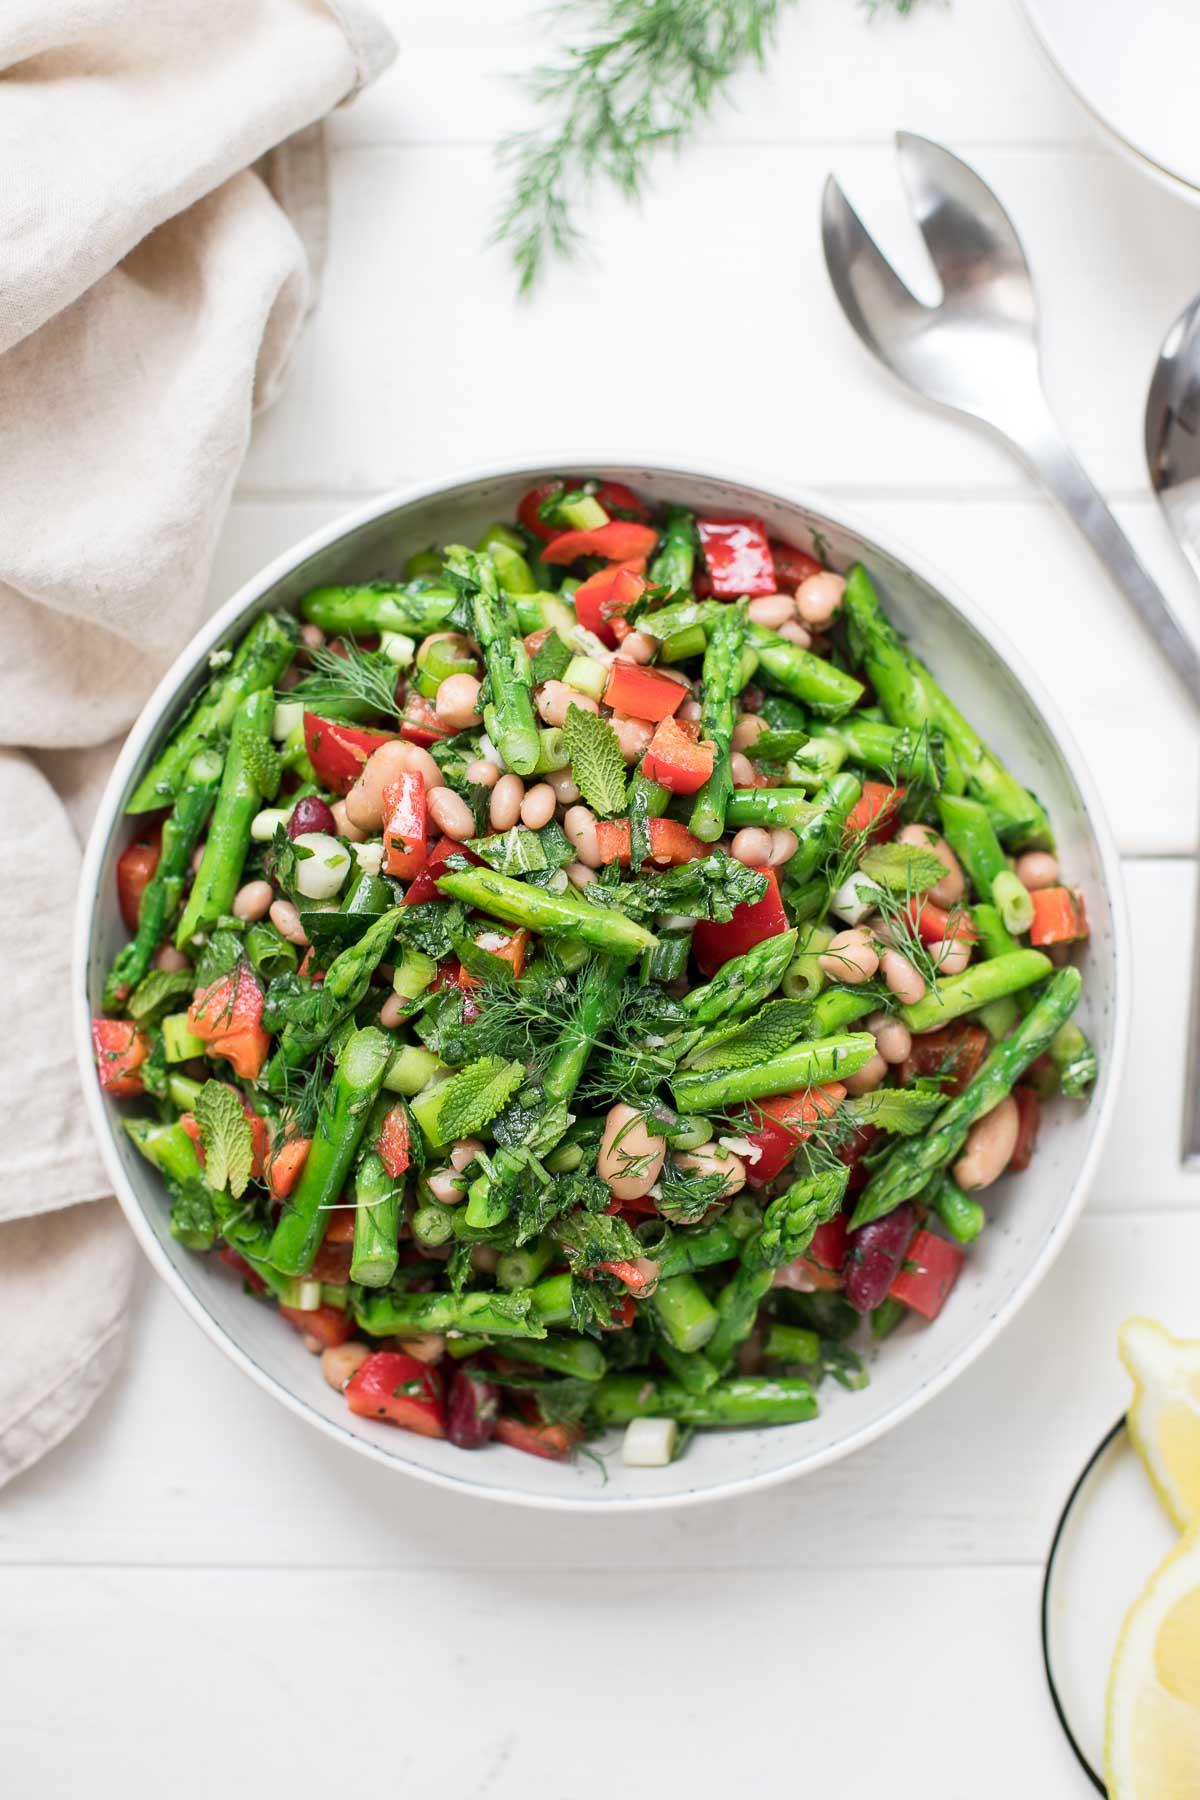 Asparagus Salad with Mixed Beans, Lemon and Herbs